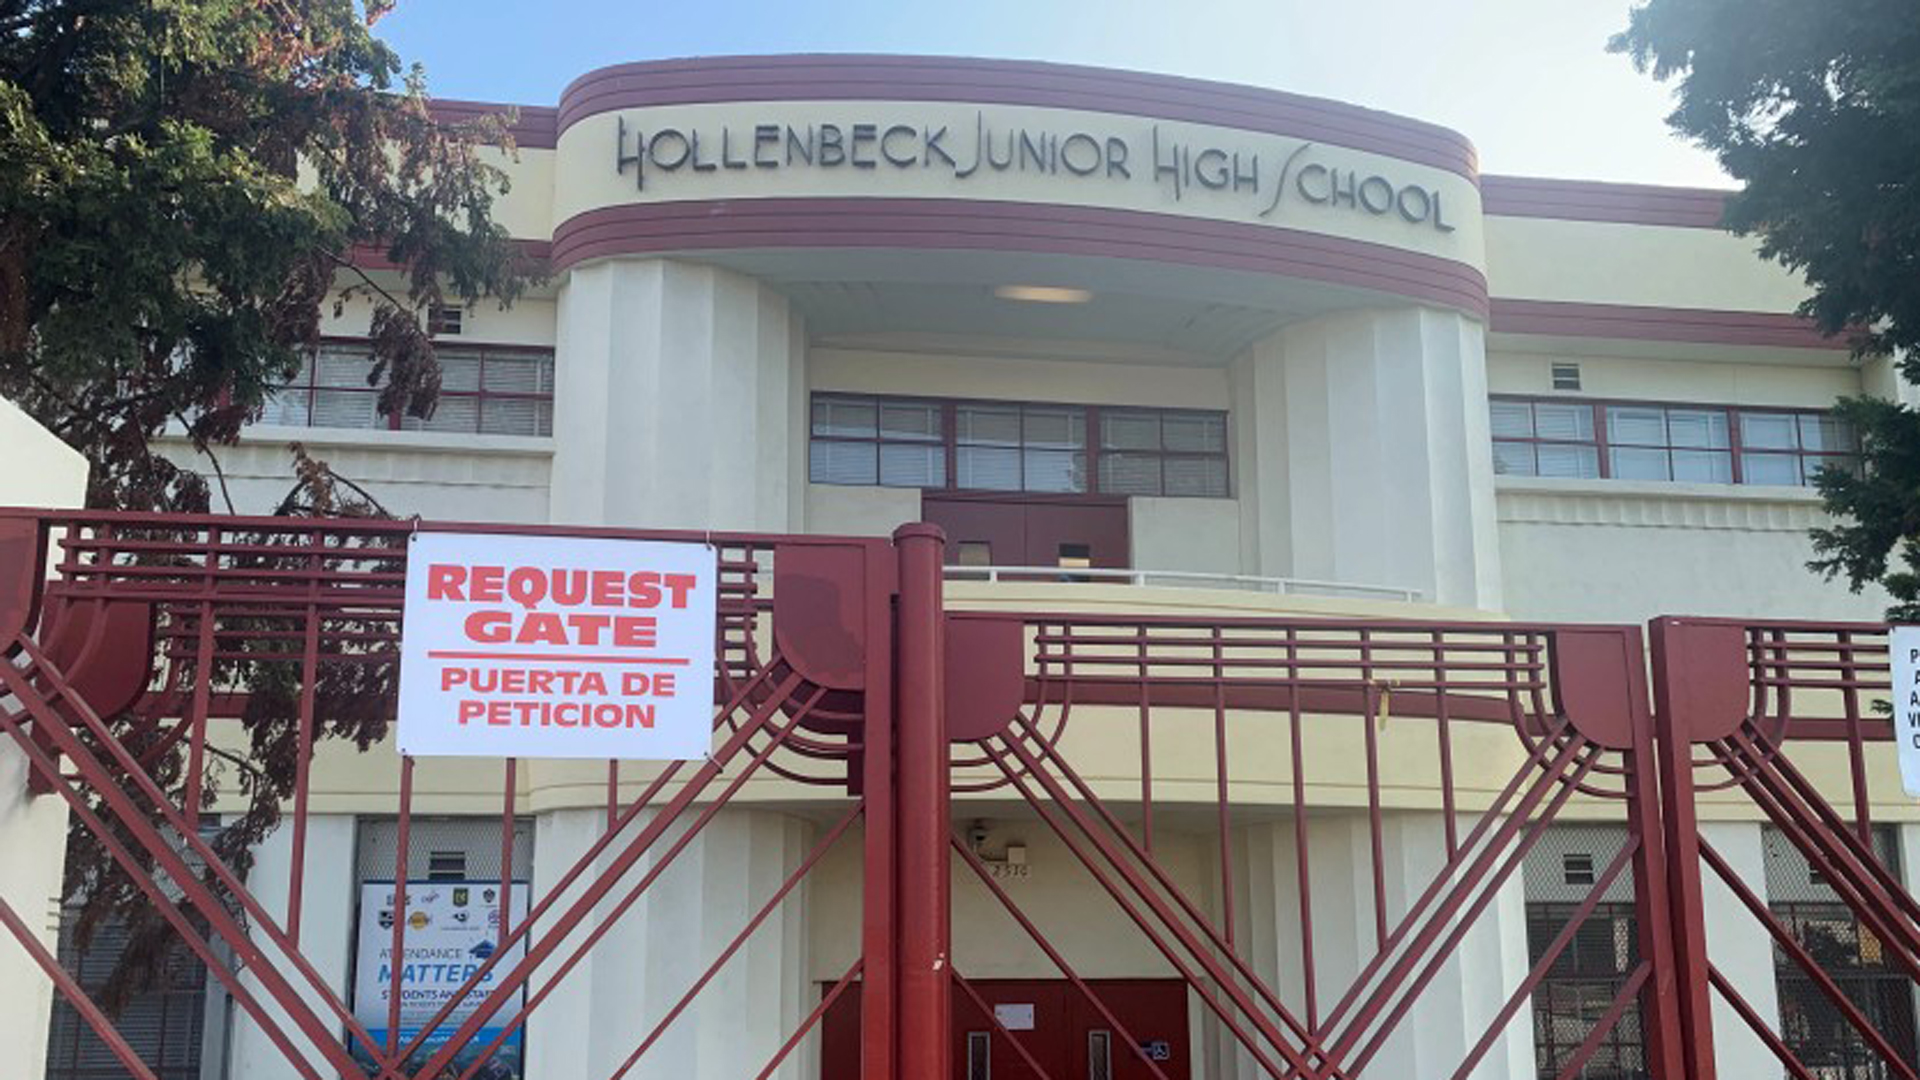 Hollenbeck Junior High School is seen in an undated image. (Credit: Sonali Kohli/Los Angeles TImes)